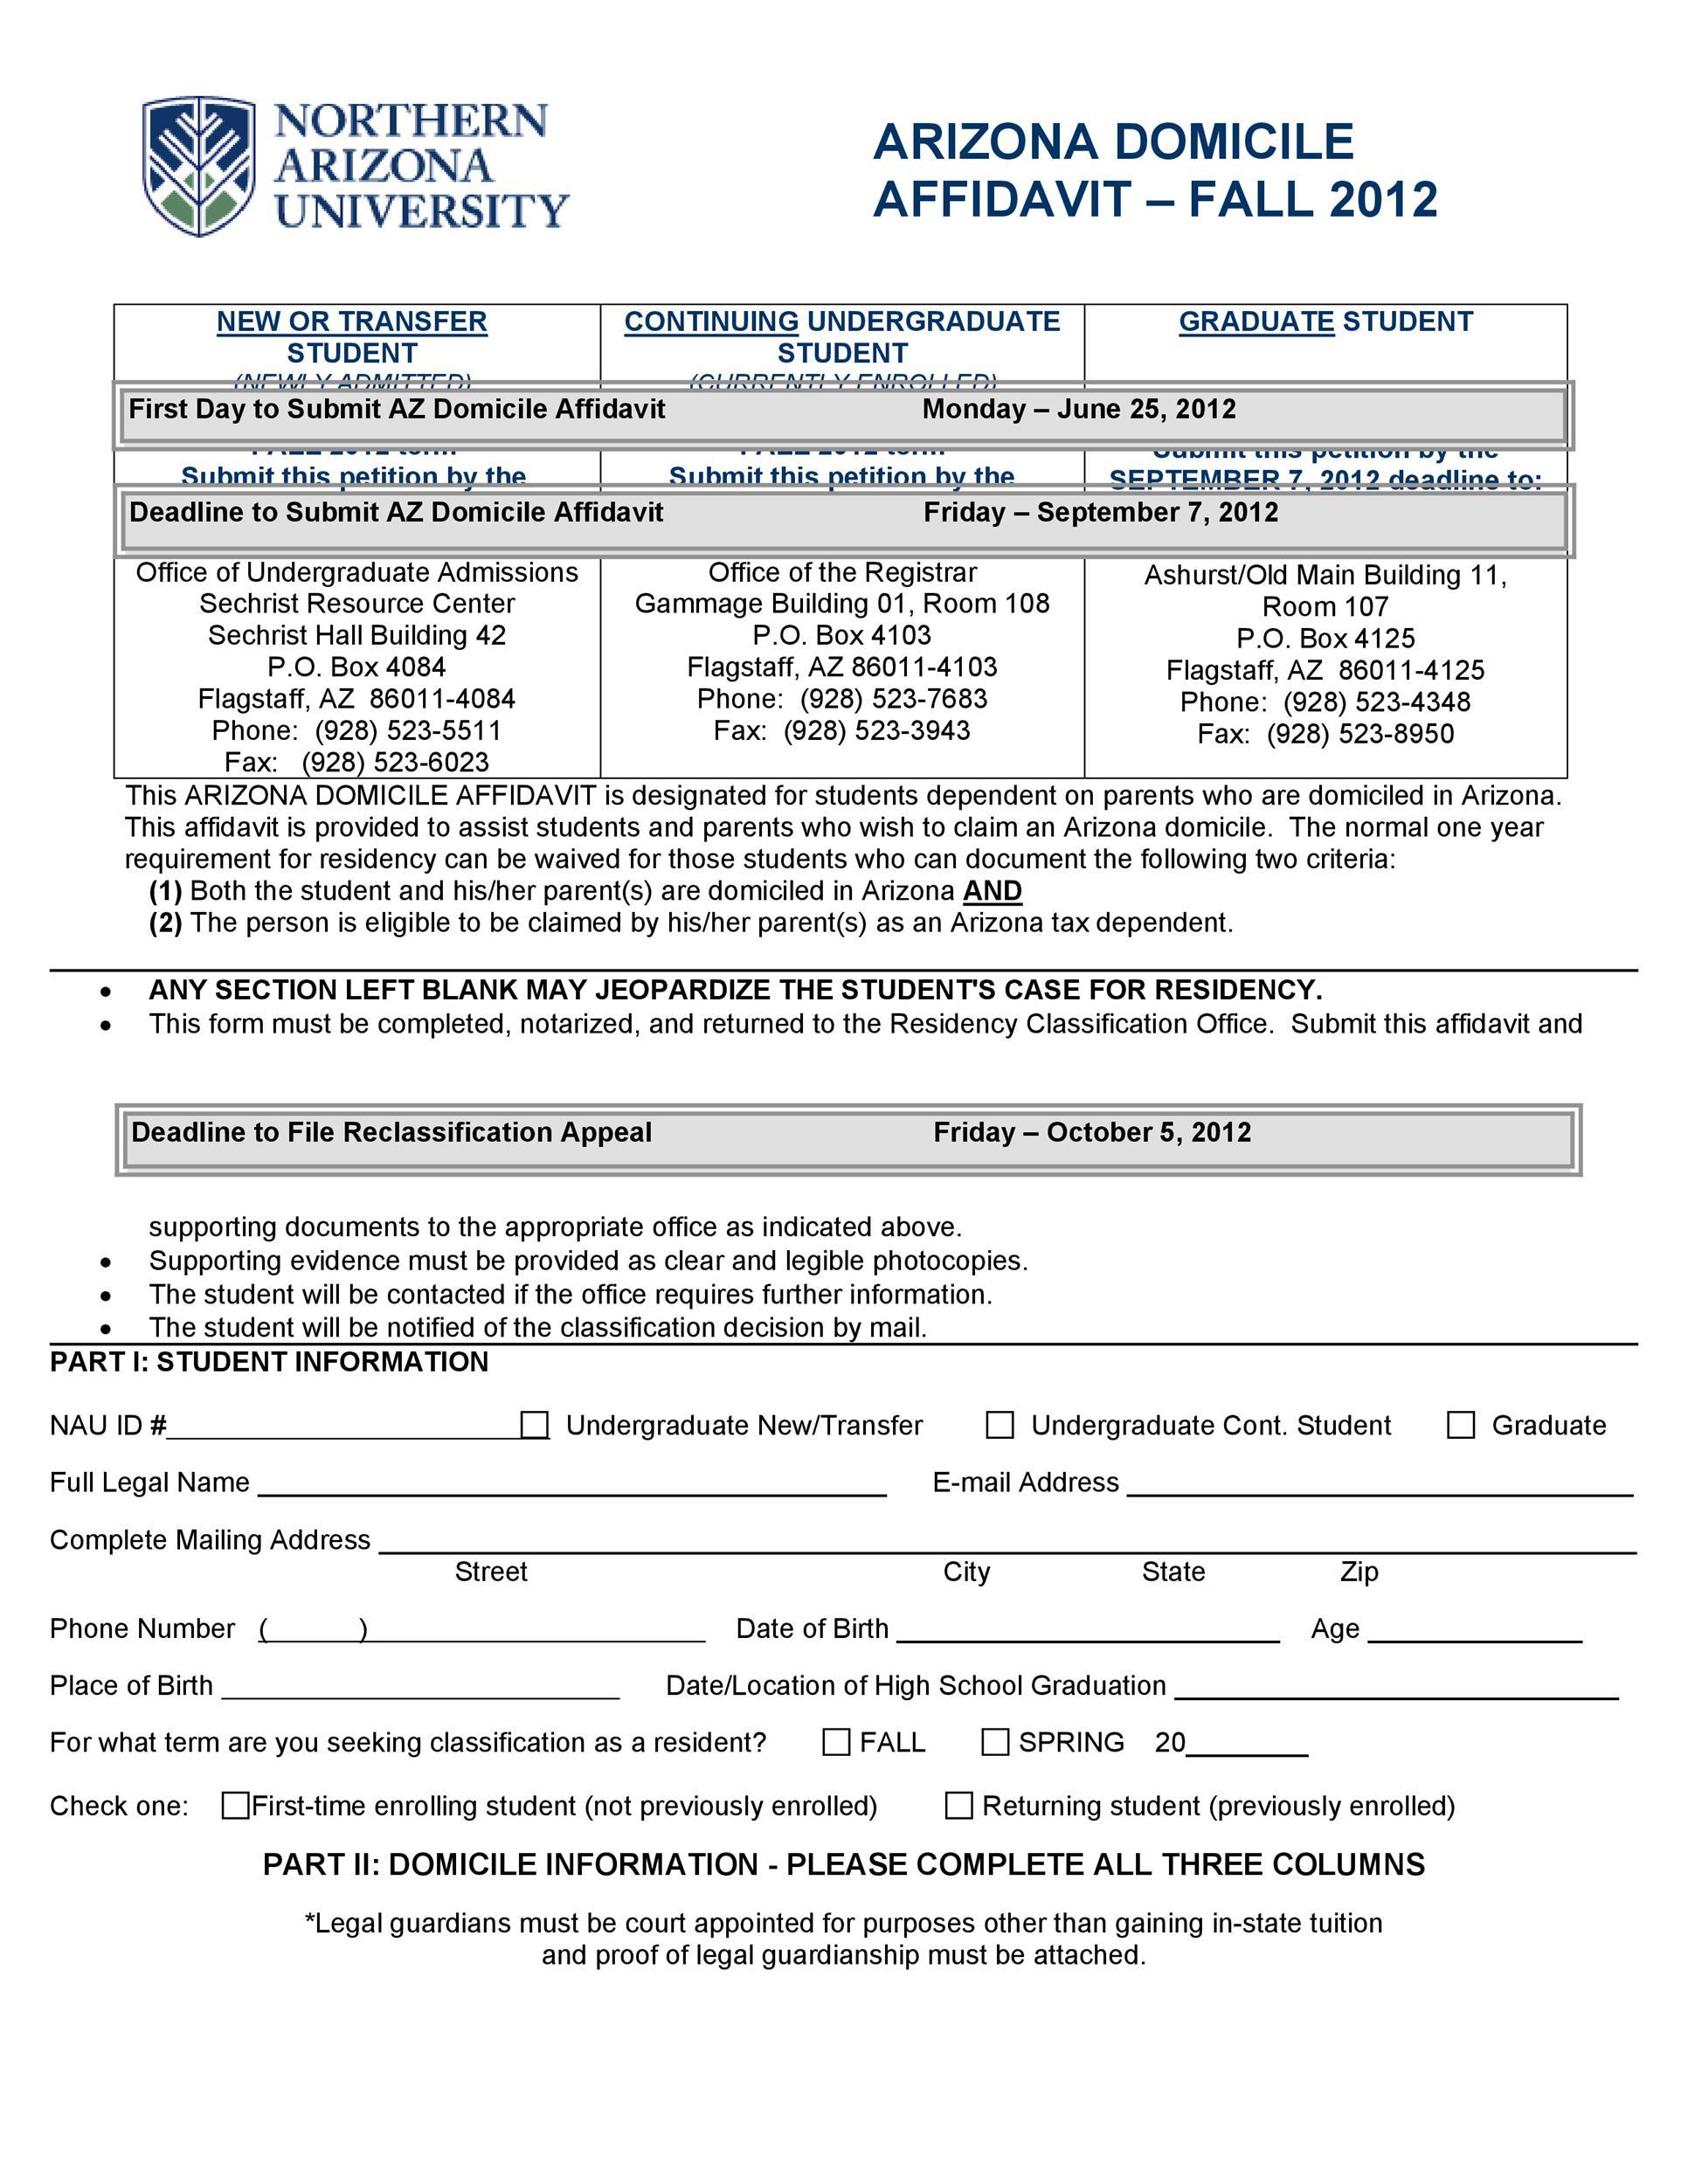 Free affidavit of domicile 17